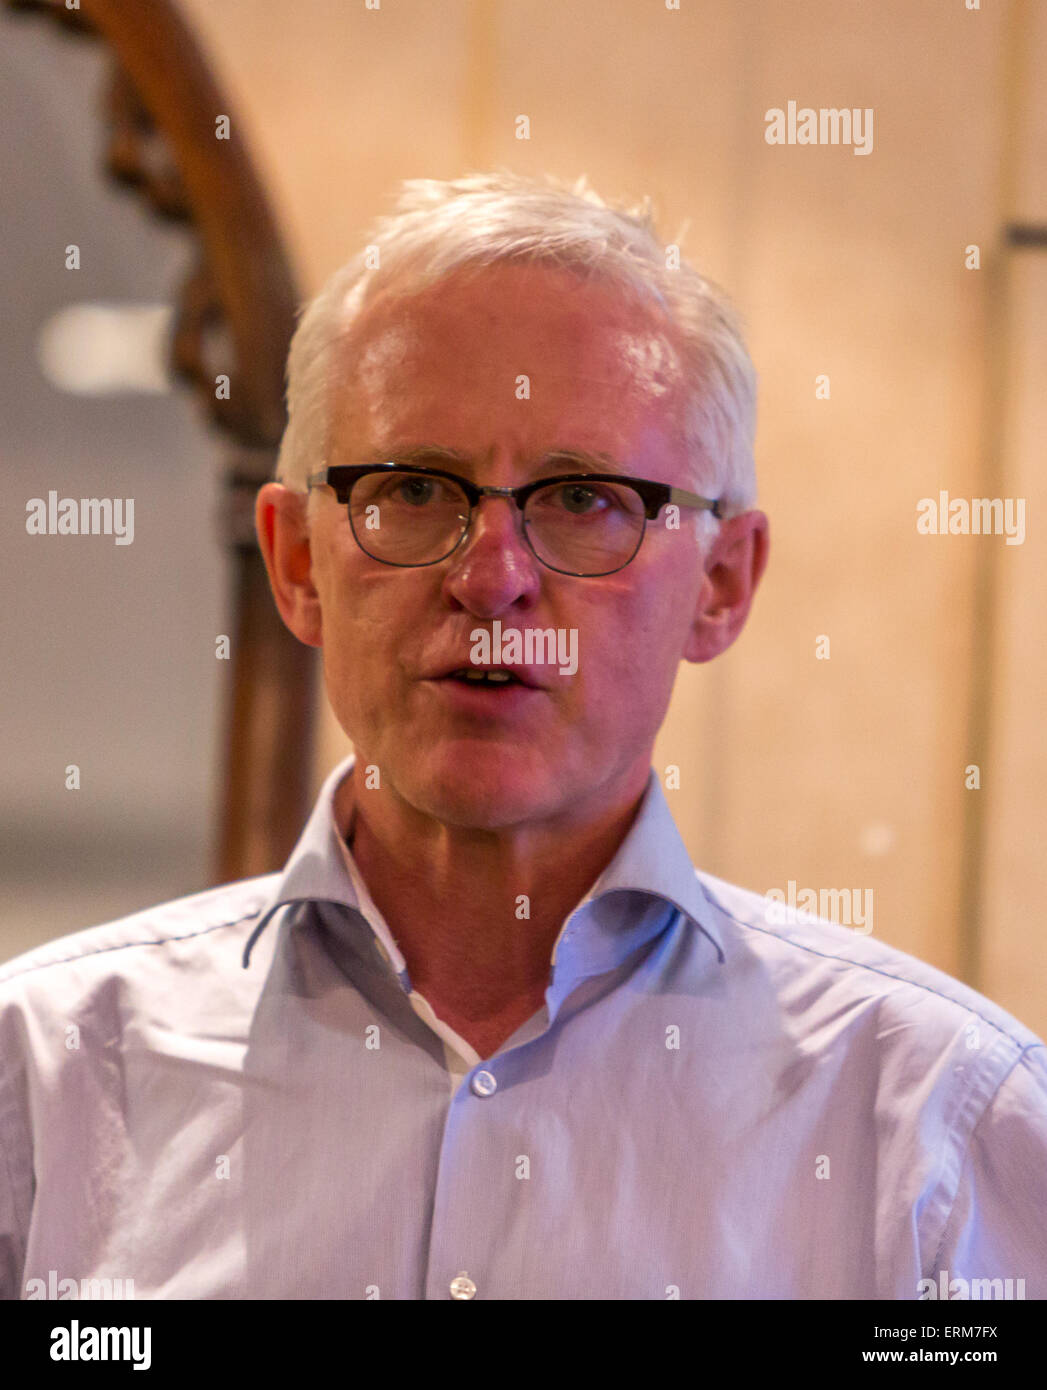 Norman Lamb on his bid for leadership of the Liberal Democrats - Stock Image